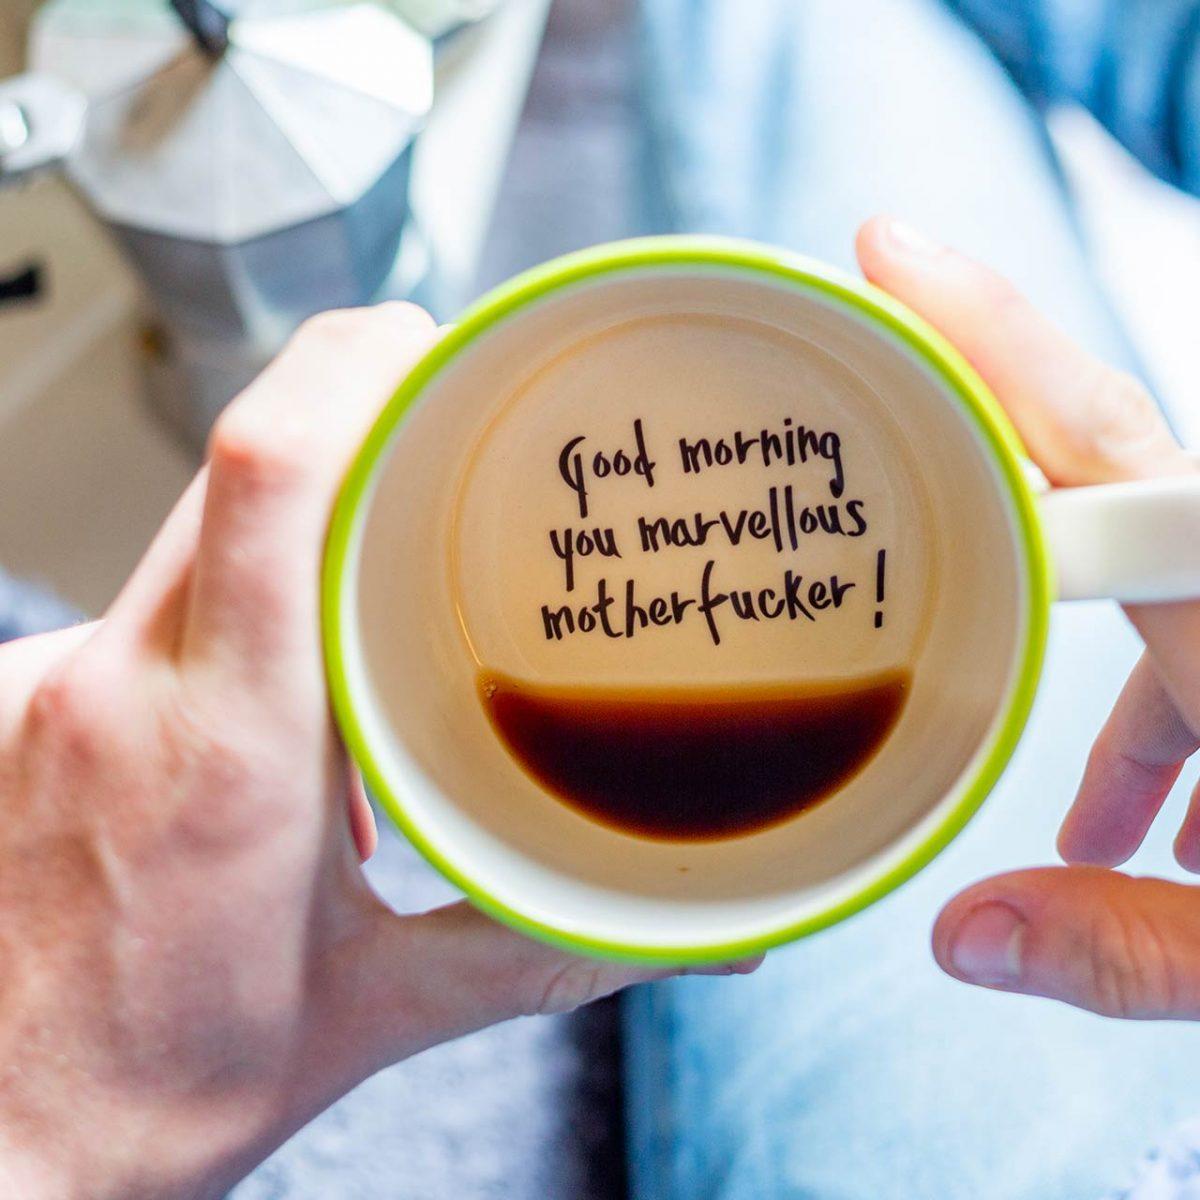 Good Morning You Marvellous Motherfucker - Handmade Mug - Kate Ceramics